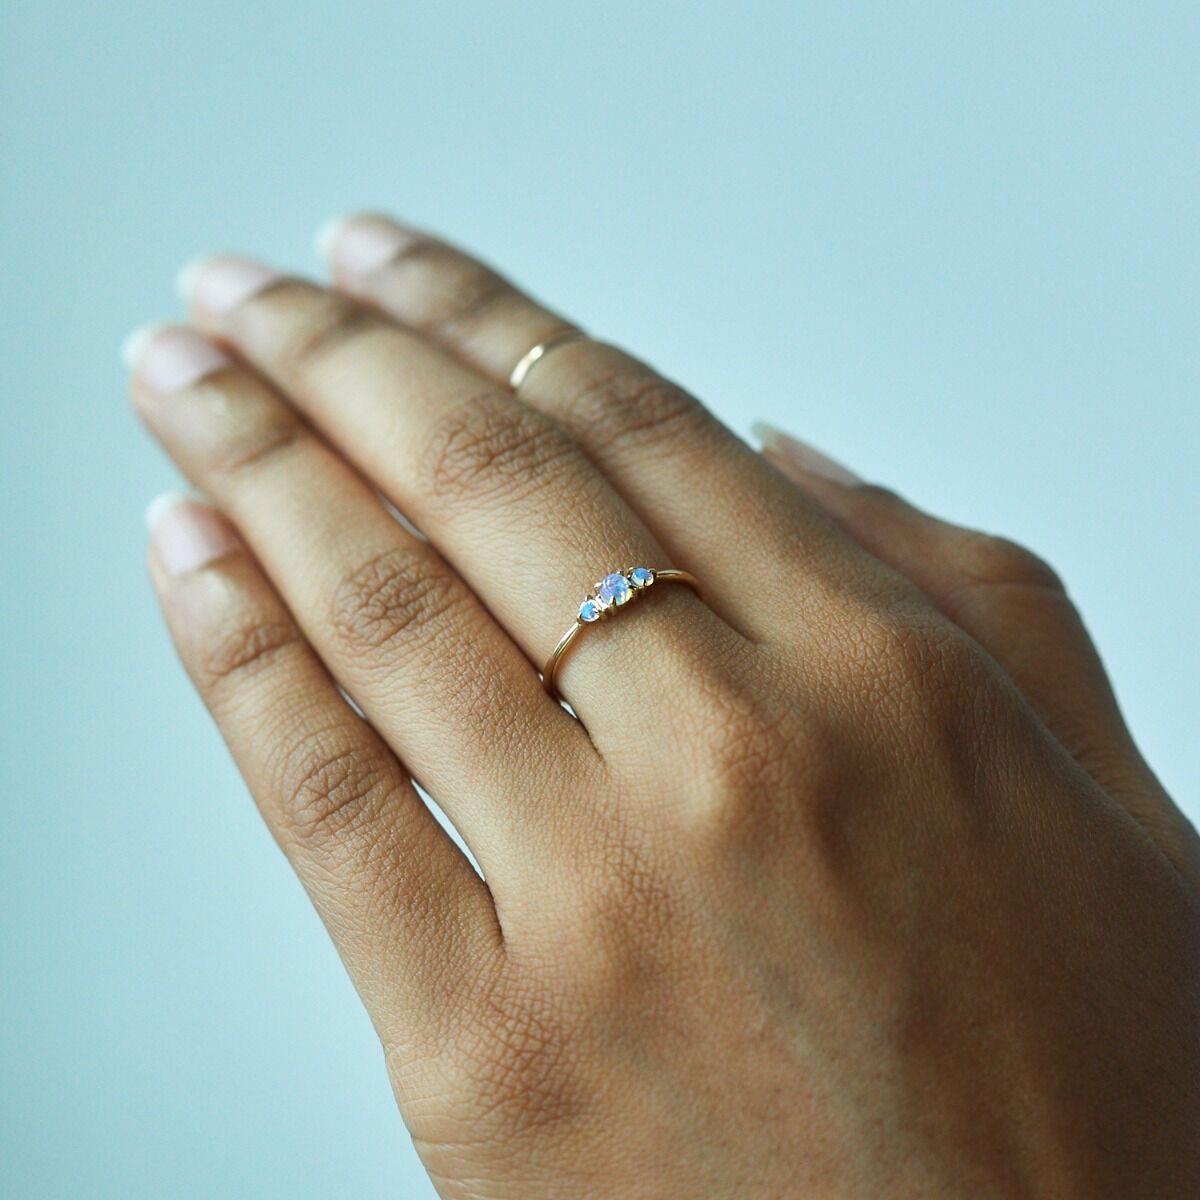 woman's hand wearing thin opal ring